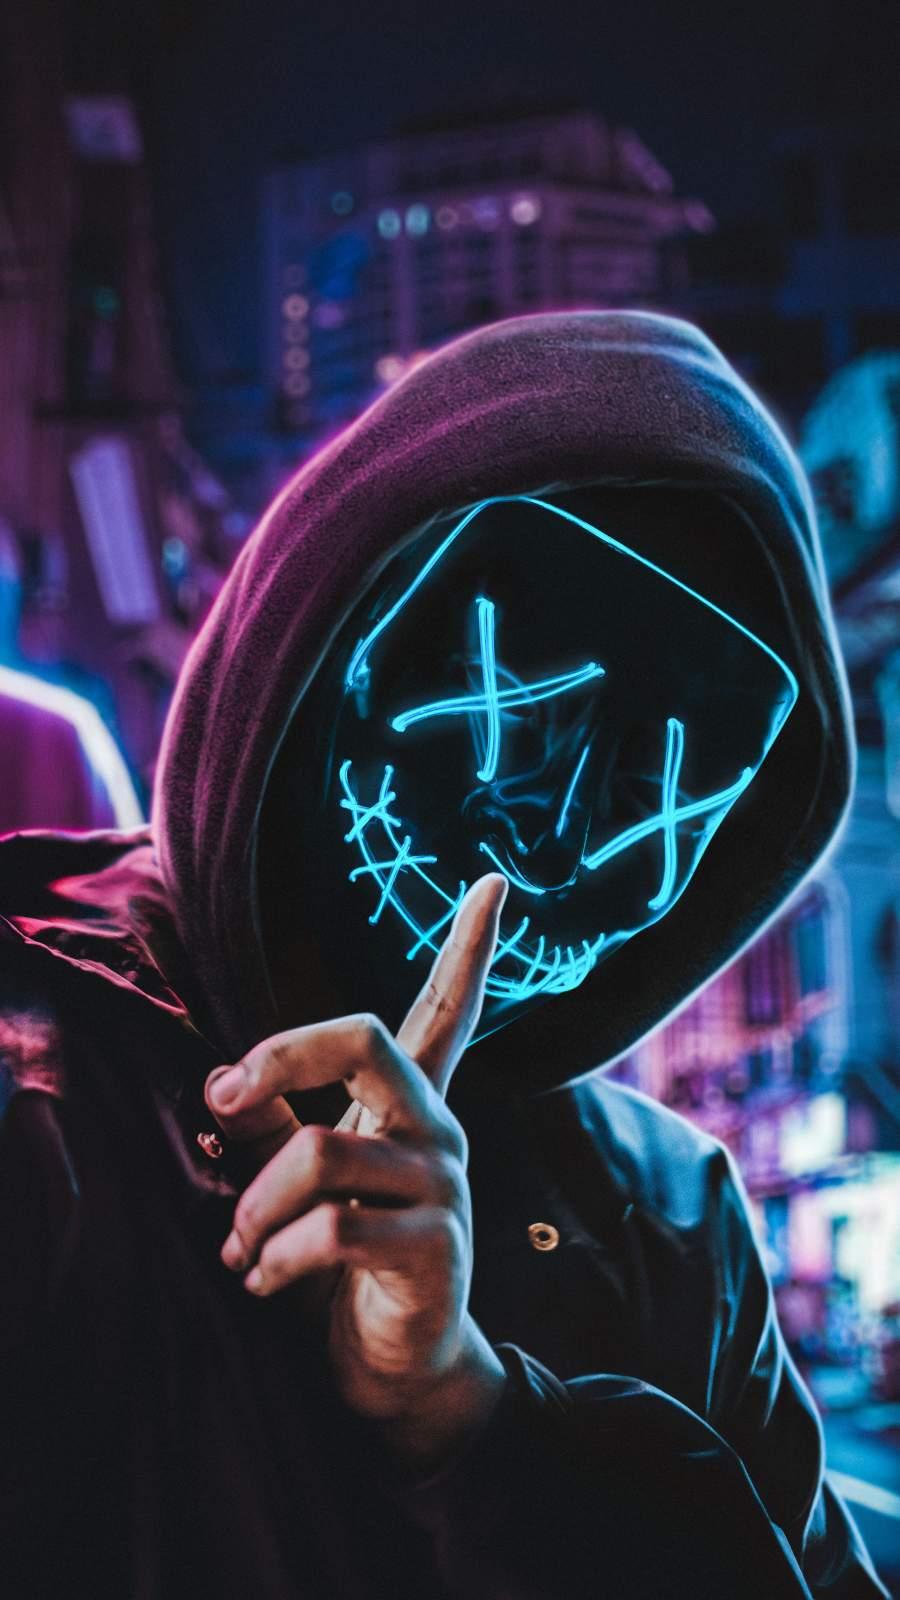 Neon Mask Hoodie Guy